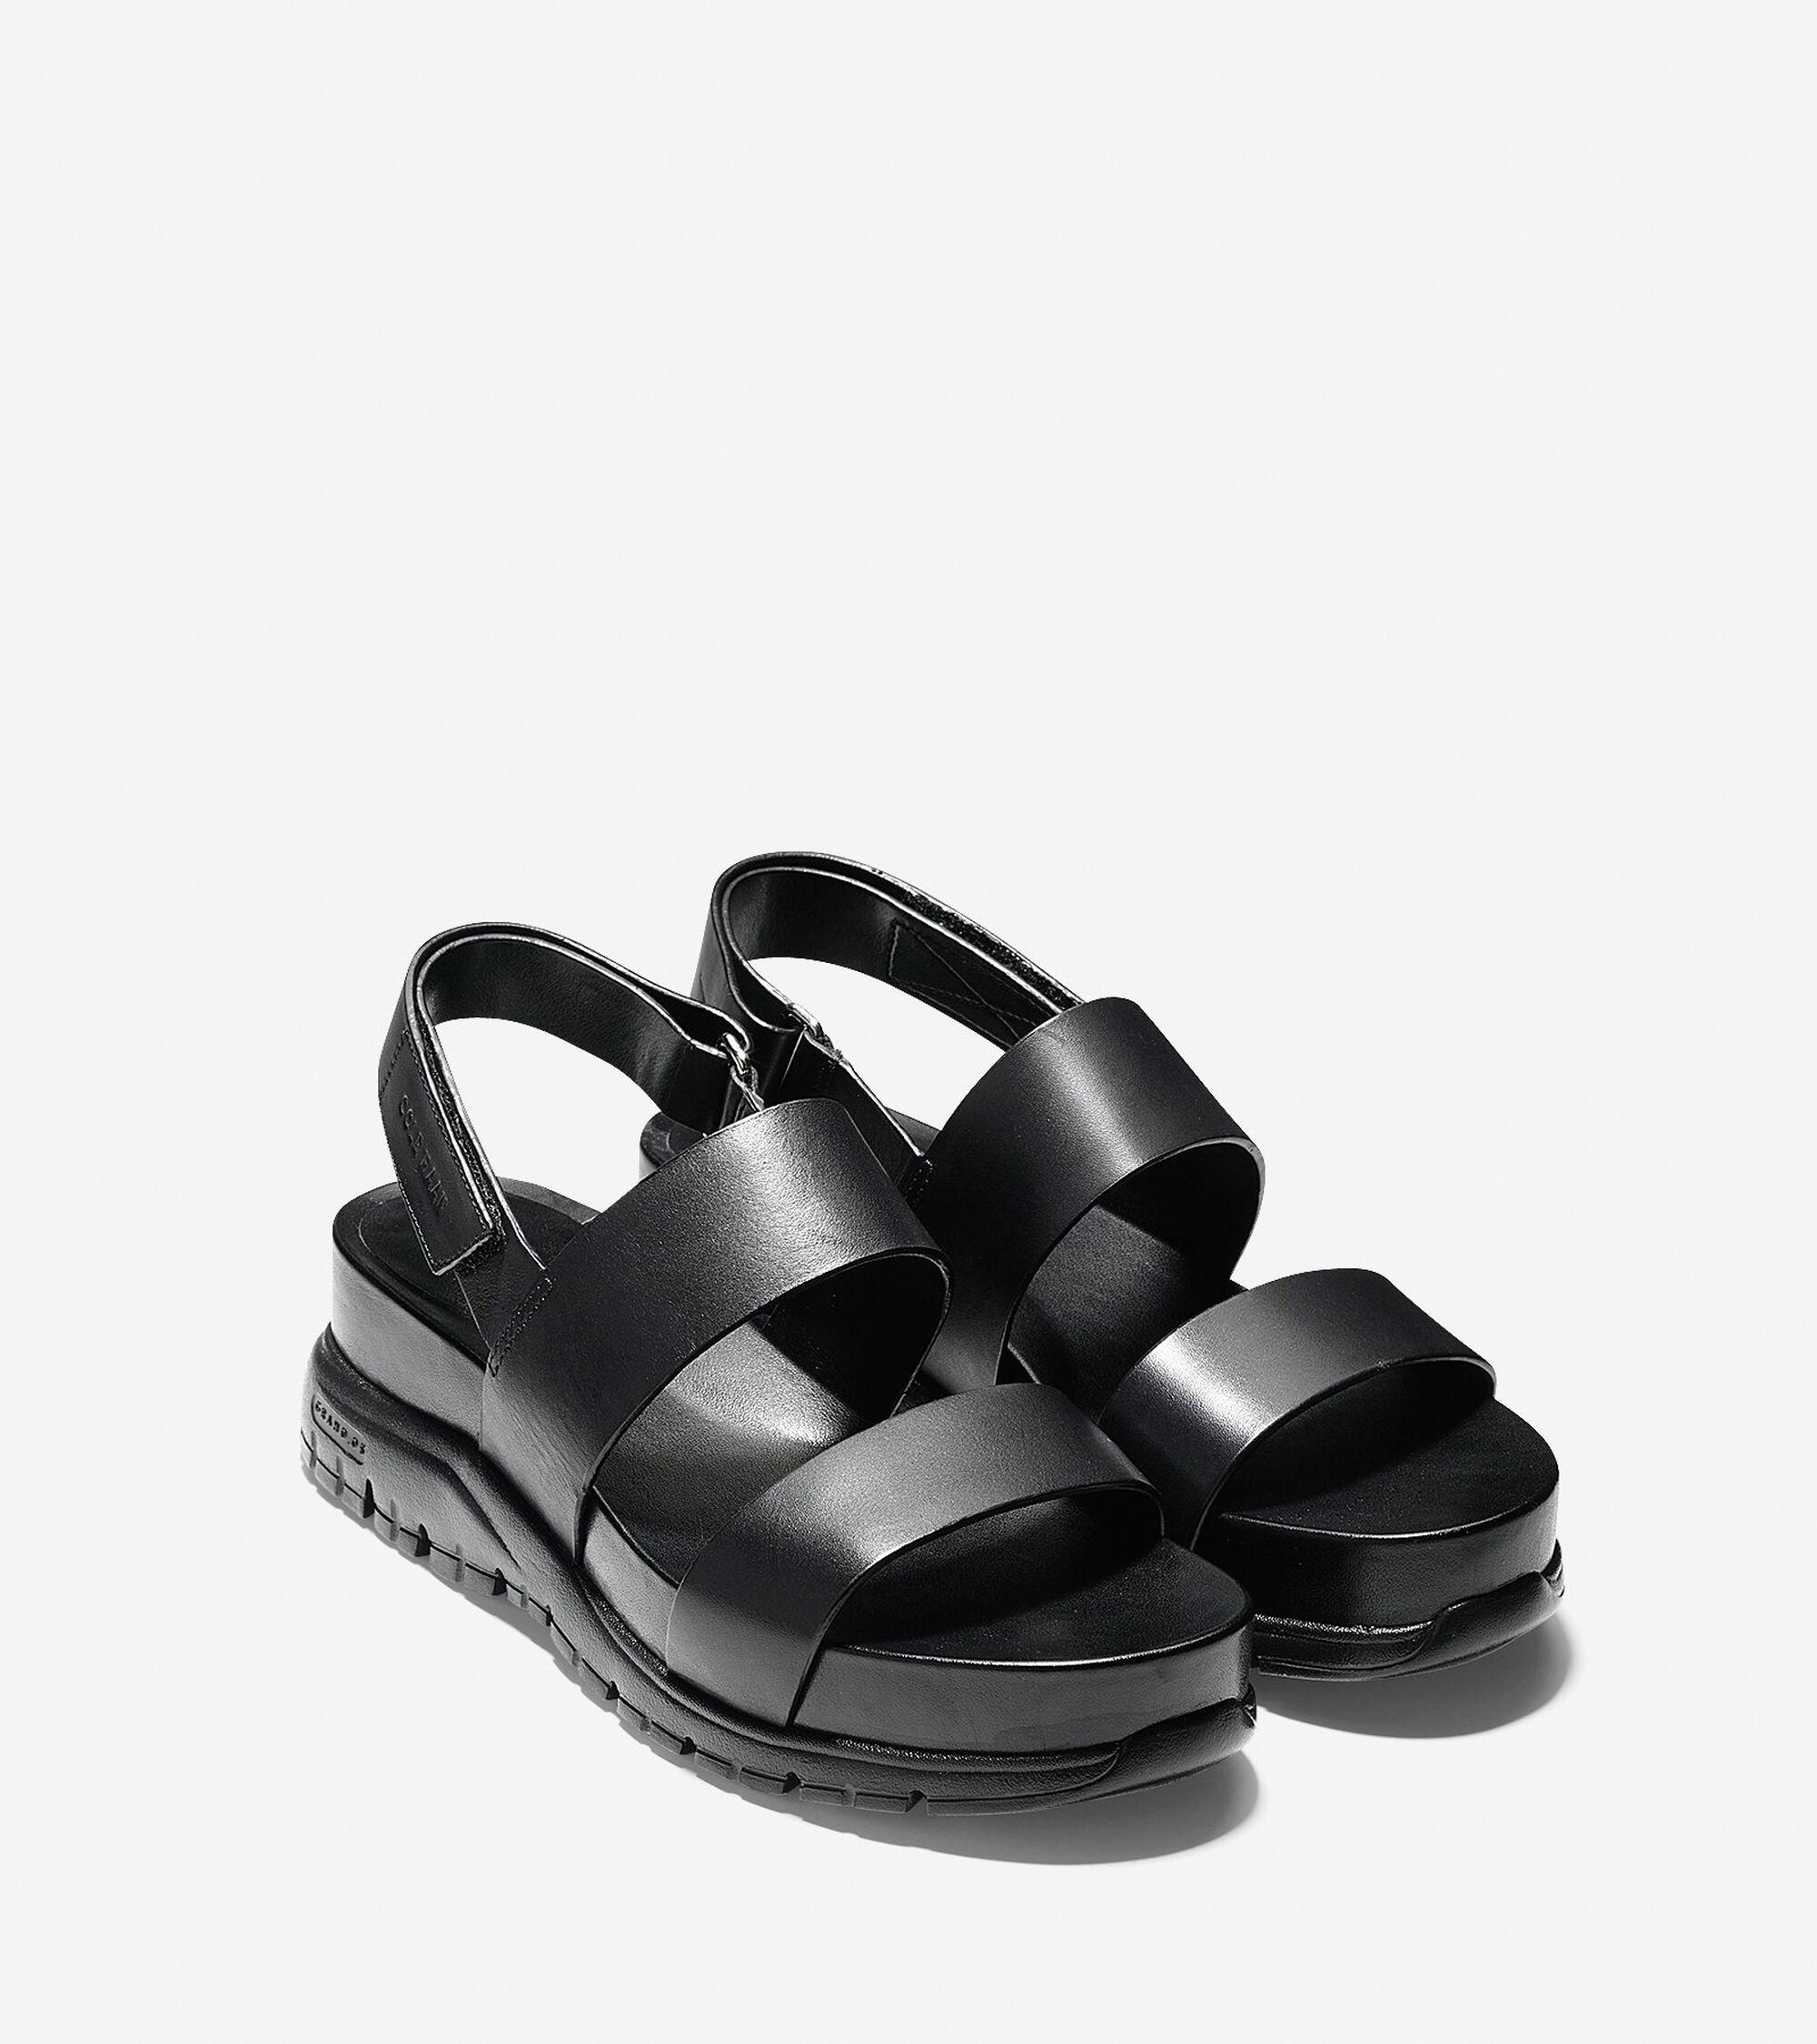 496bd8f80b6 Women s ZEROGRAND Slide Sandals in Black